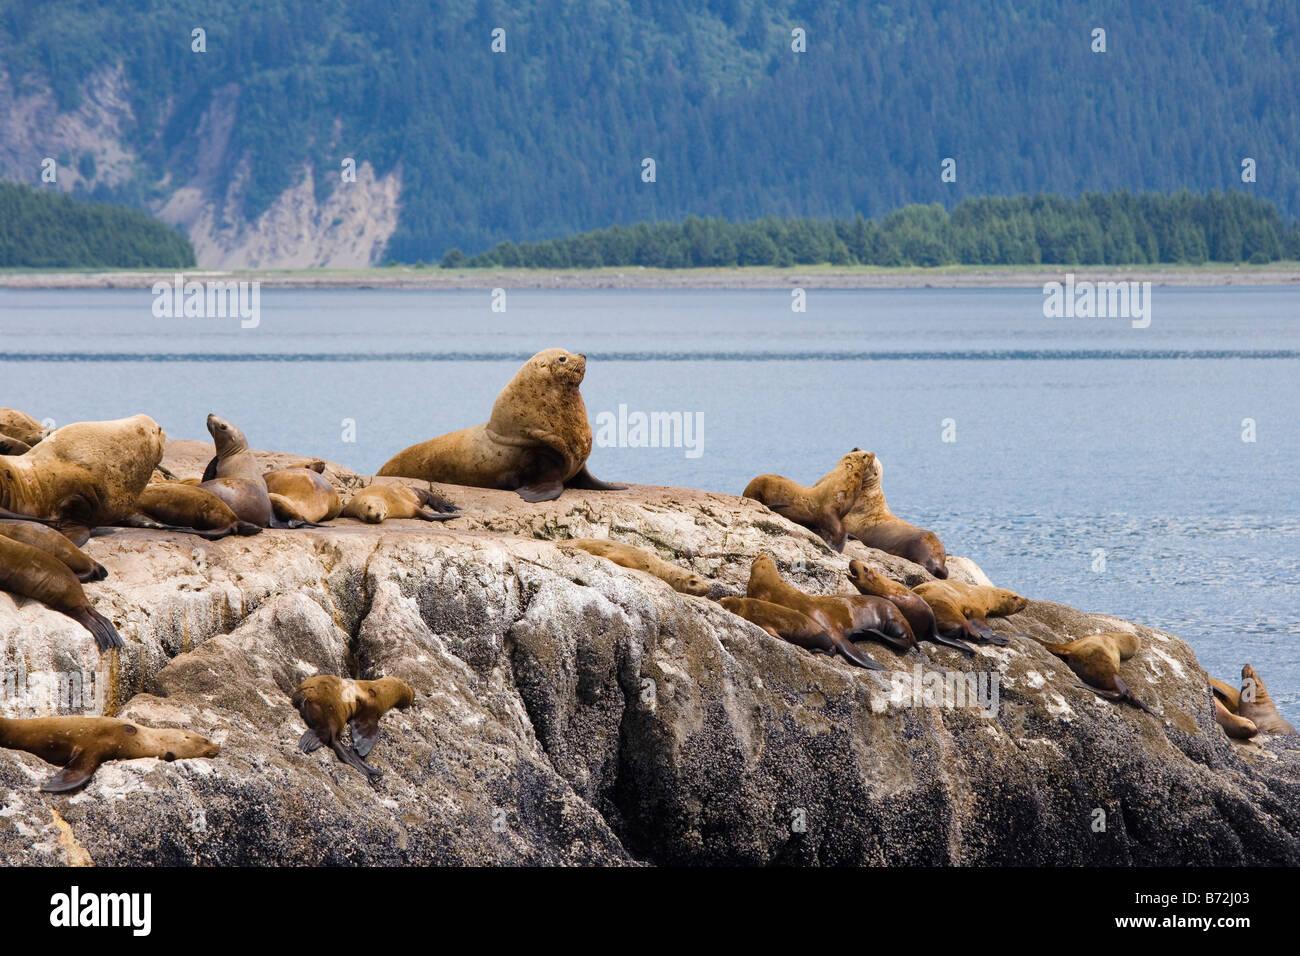 Sea Lions - Glacier Bay National Park, Alaska - Stock Image